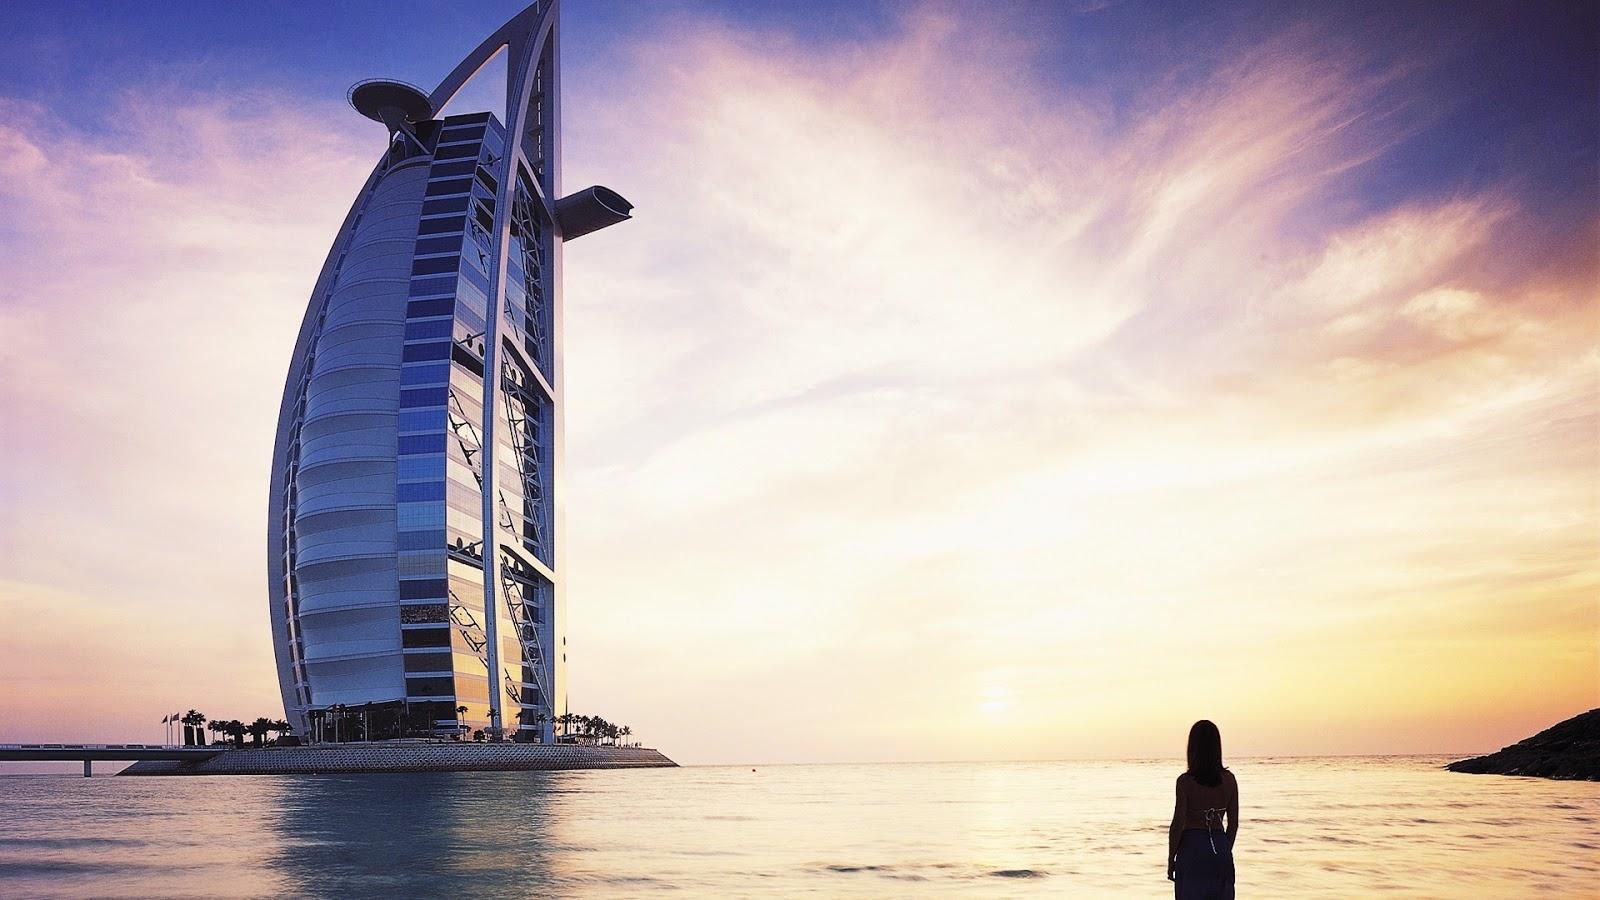 World Beautifull Places: All Tower Dubai Nice Image